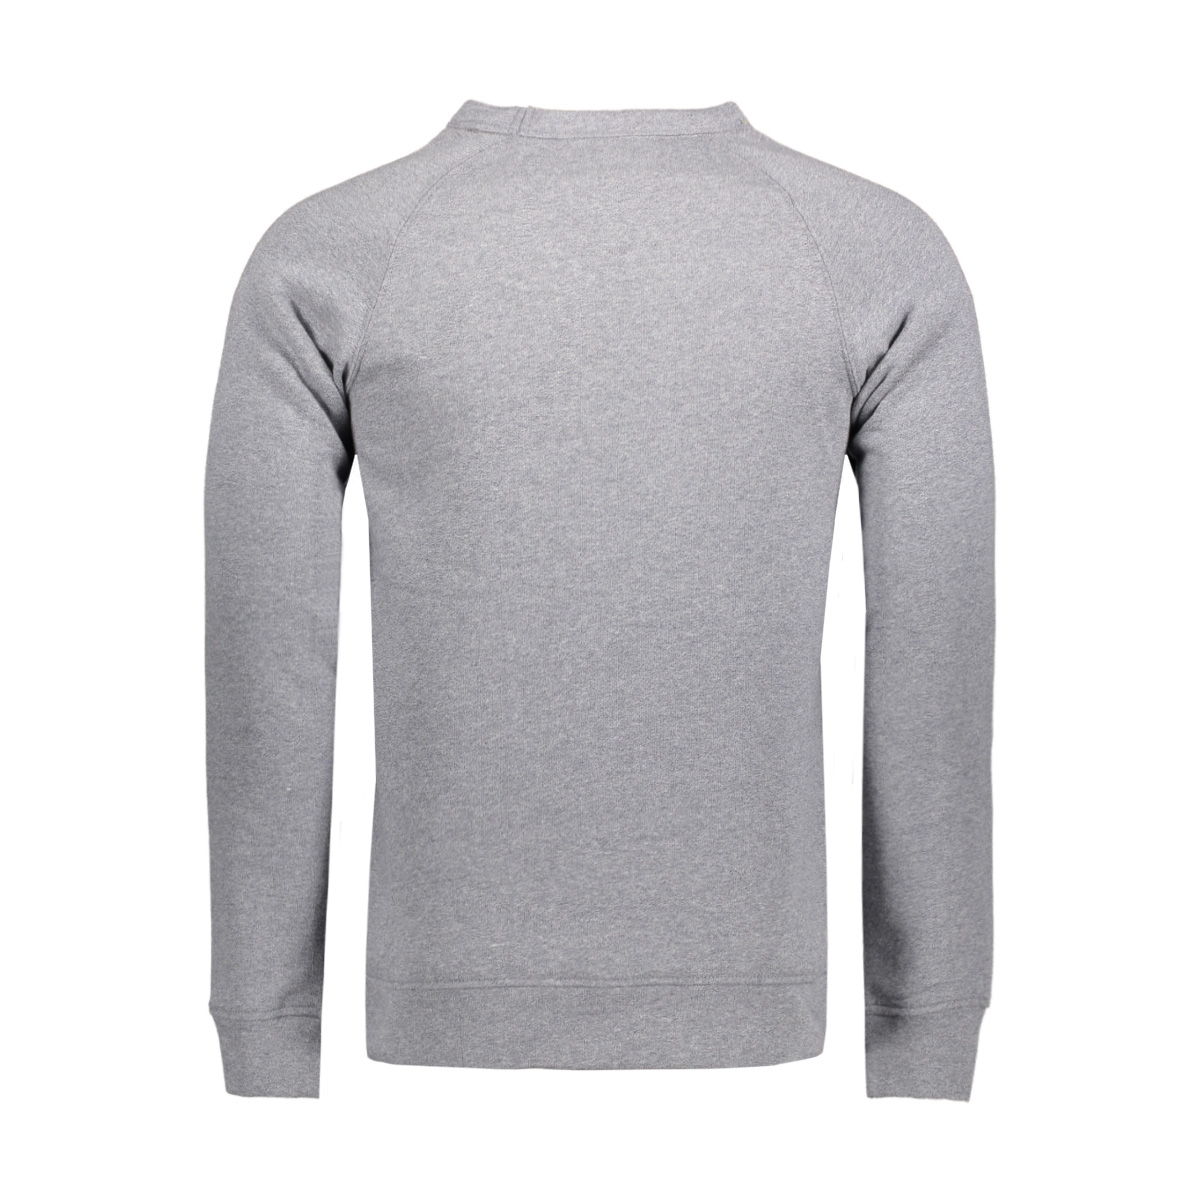 jcocaspar sweat crew neck 12128567 jack & jones sweater sky captain